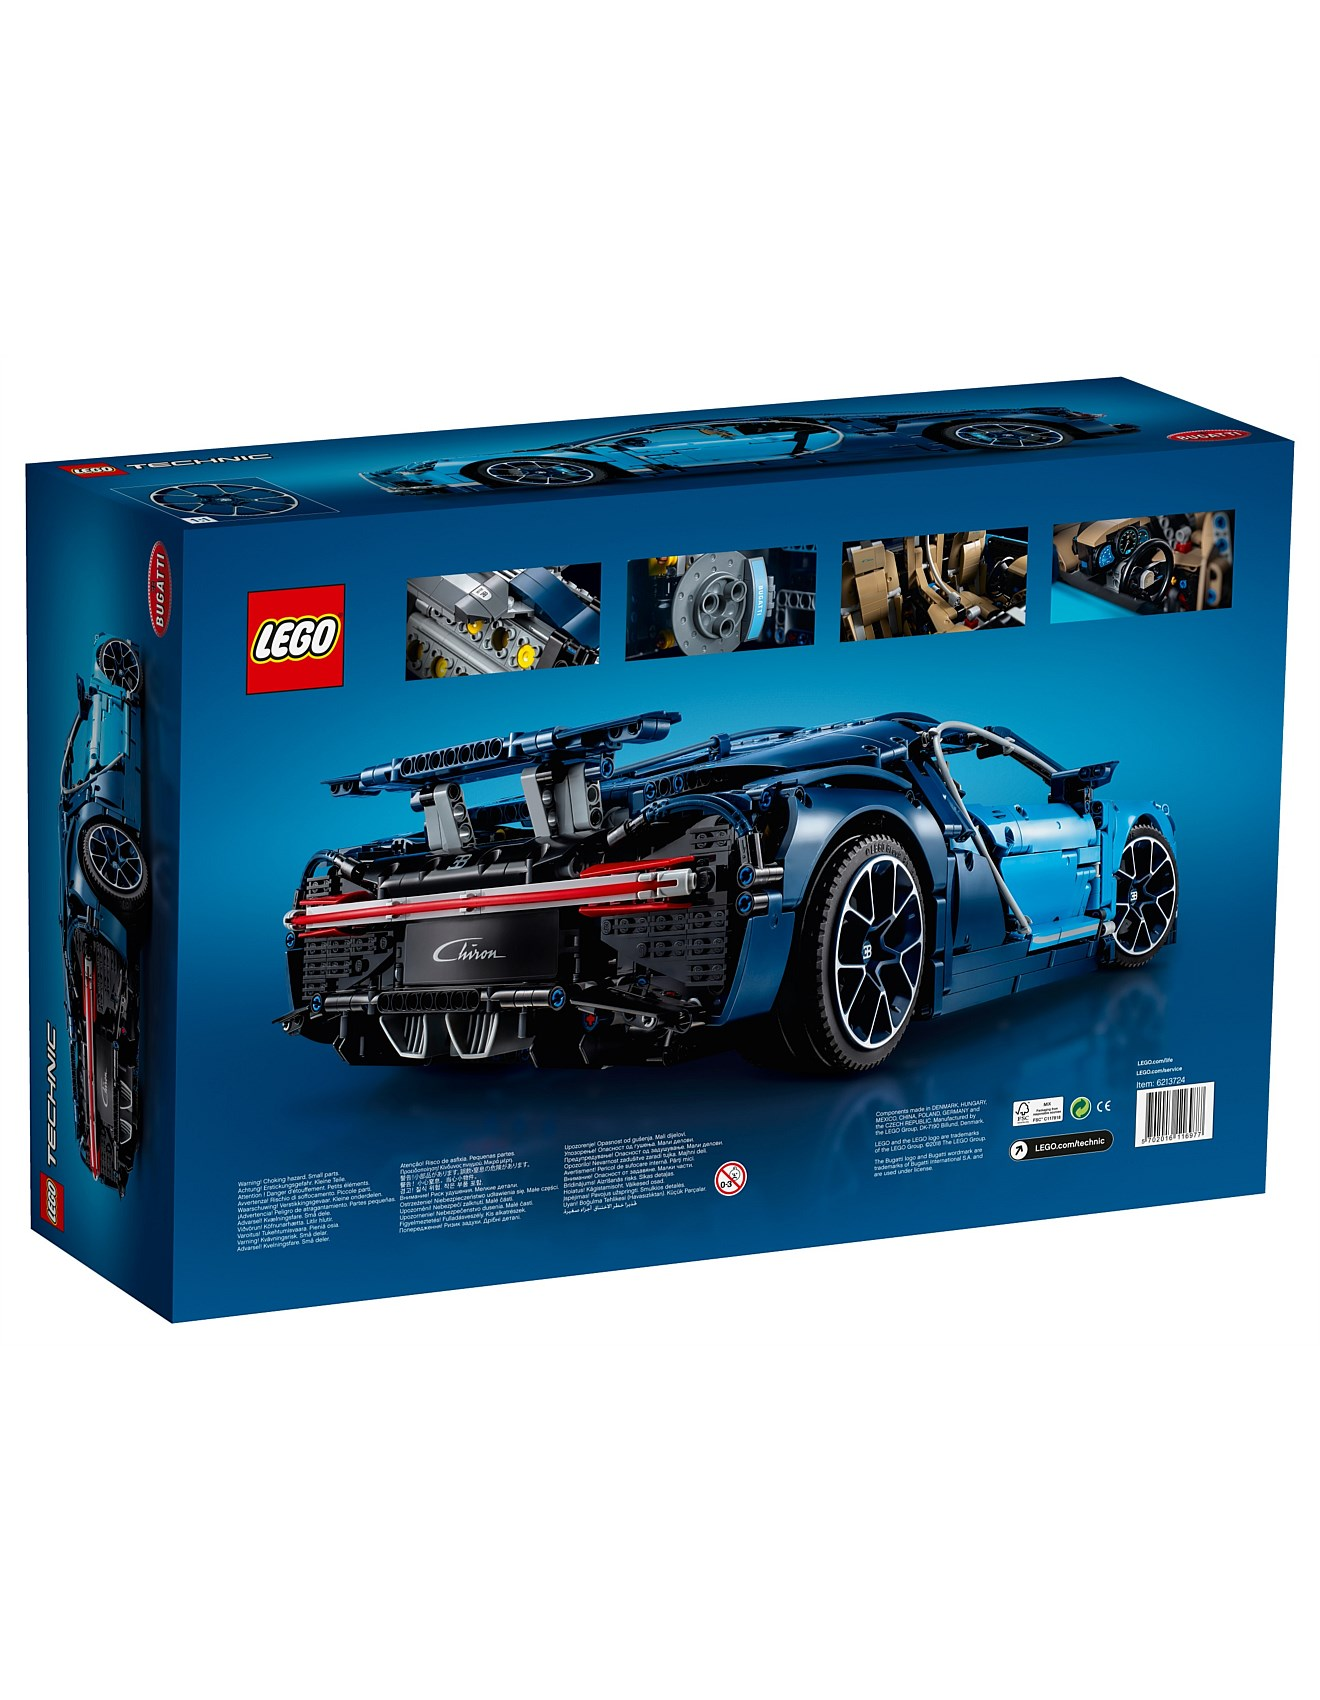 lego buy lego products online david jones lego technic. Black Bedroom Furniture Sets. Home Design Ideas